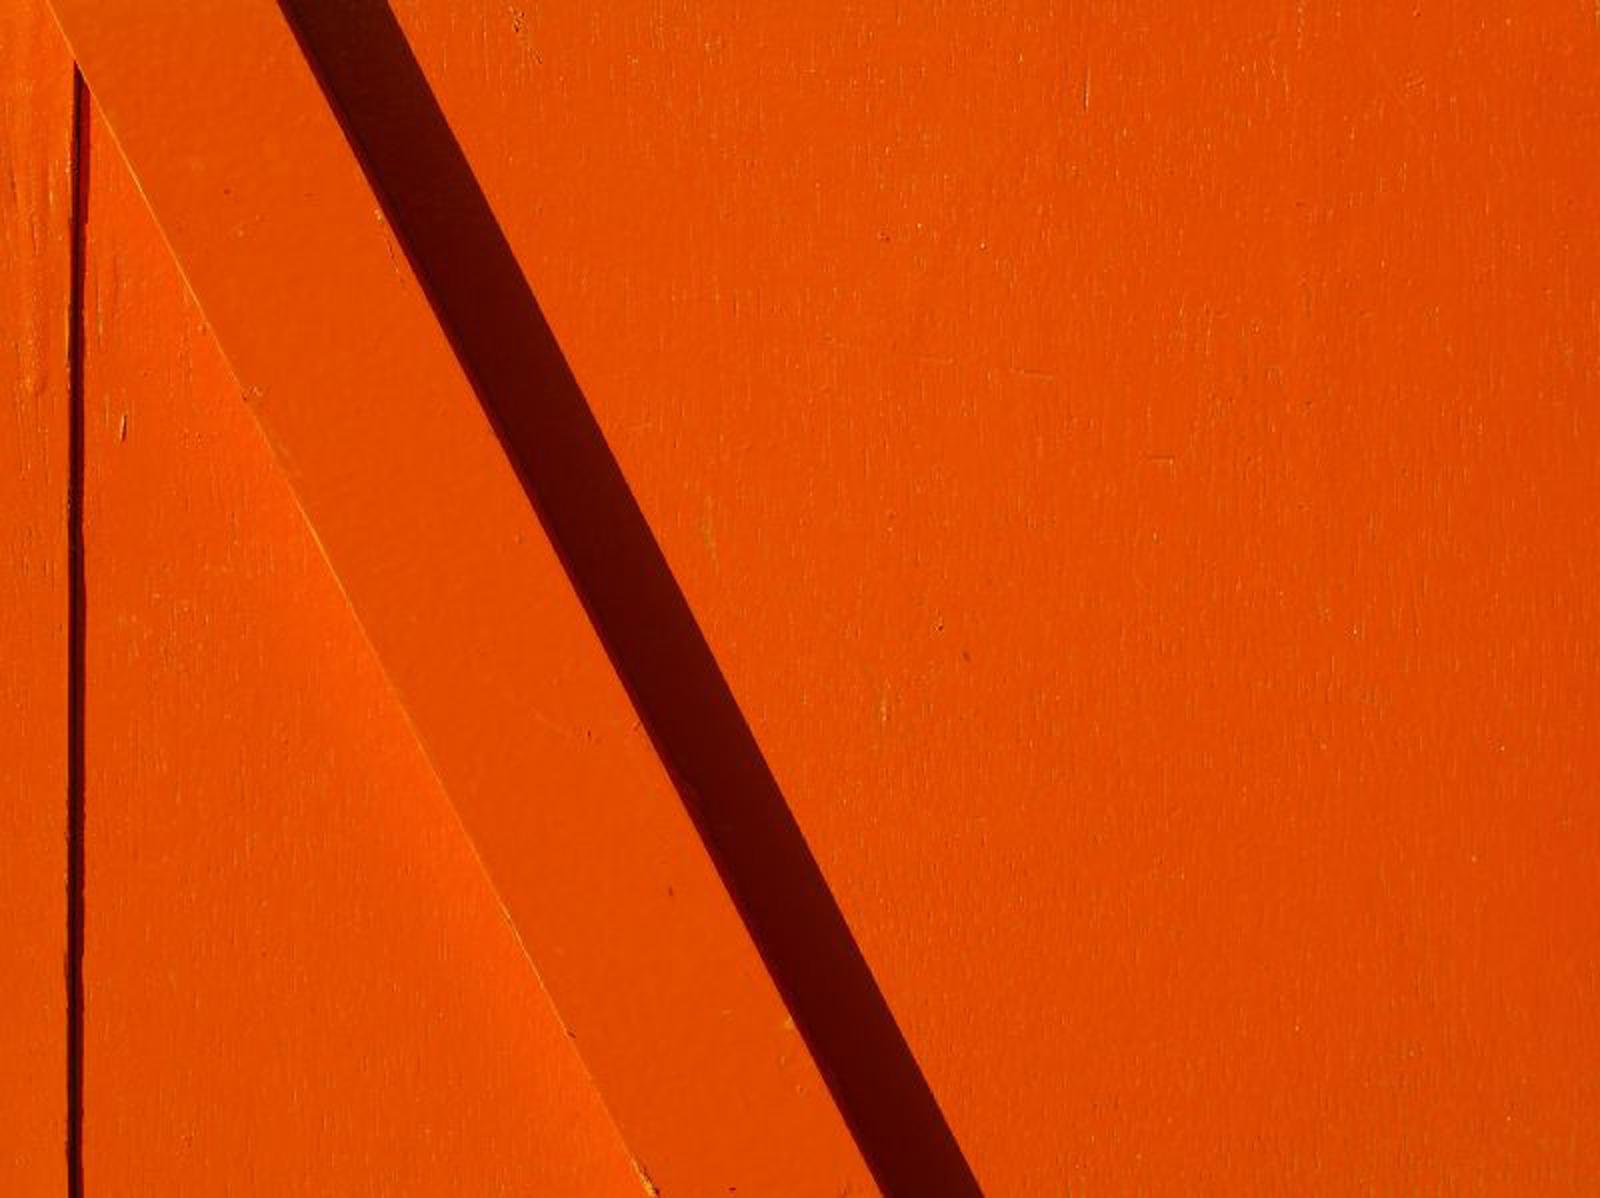 orange_shadow_2.jpg